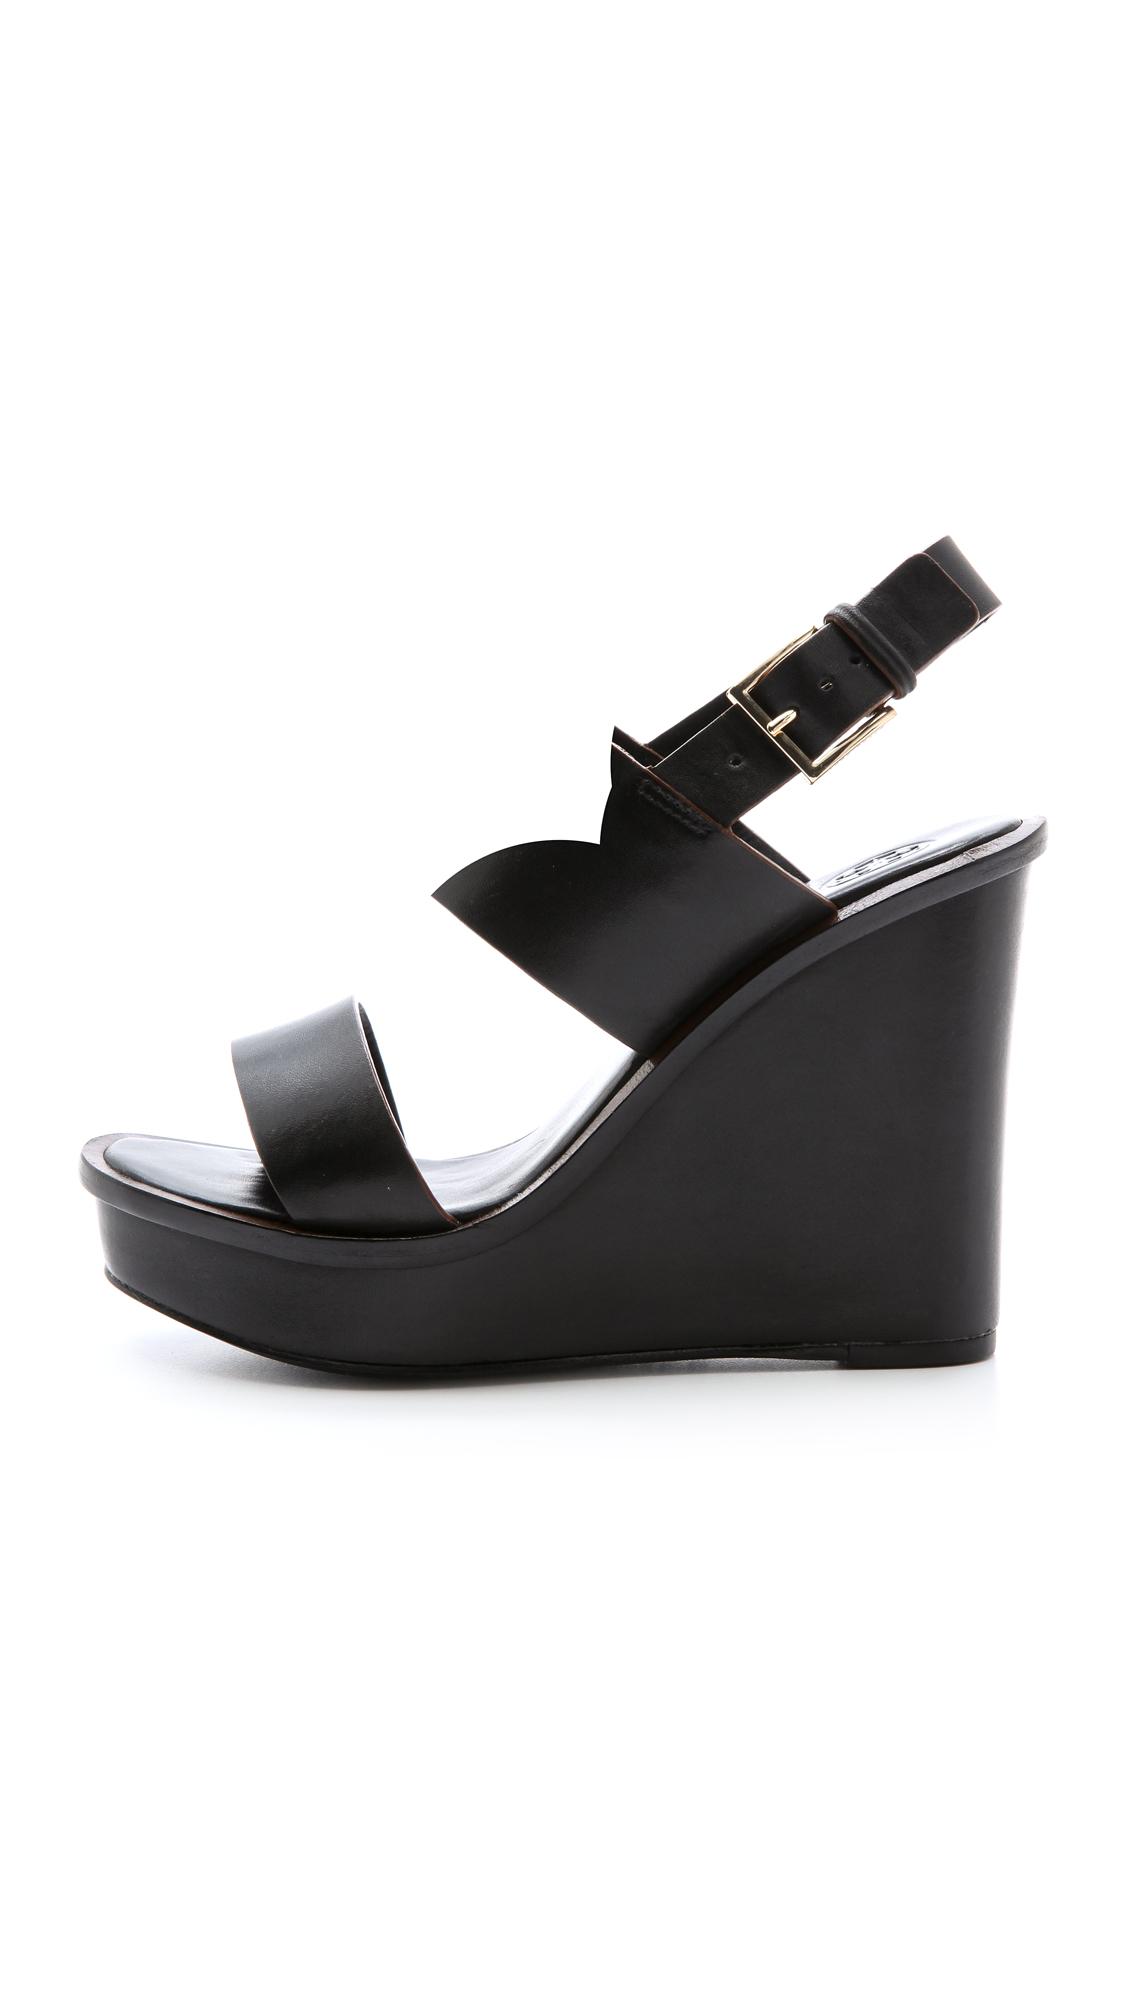 7c927ed63011f Tory Burch Lexington Wedge Sandals